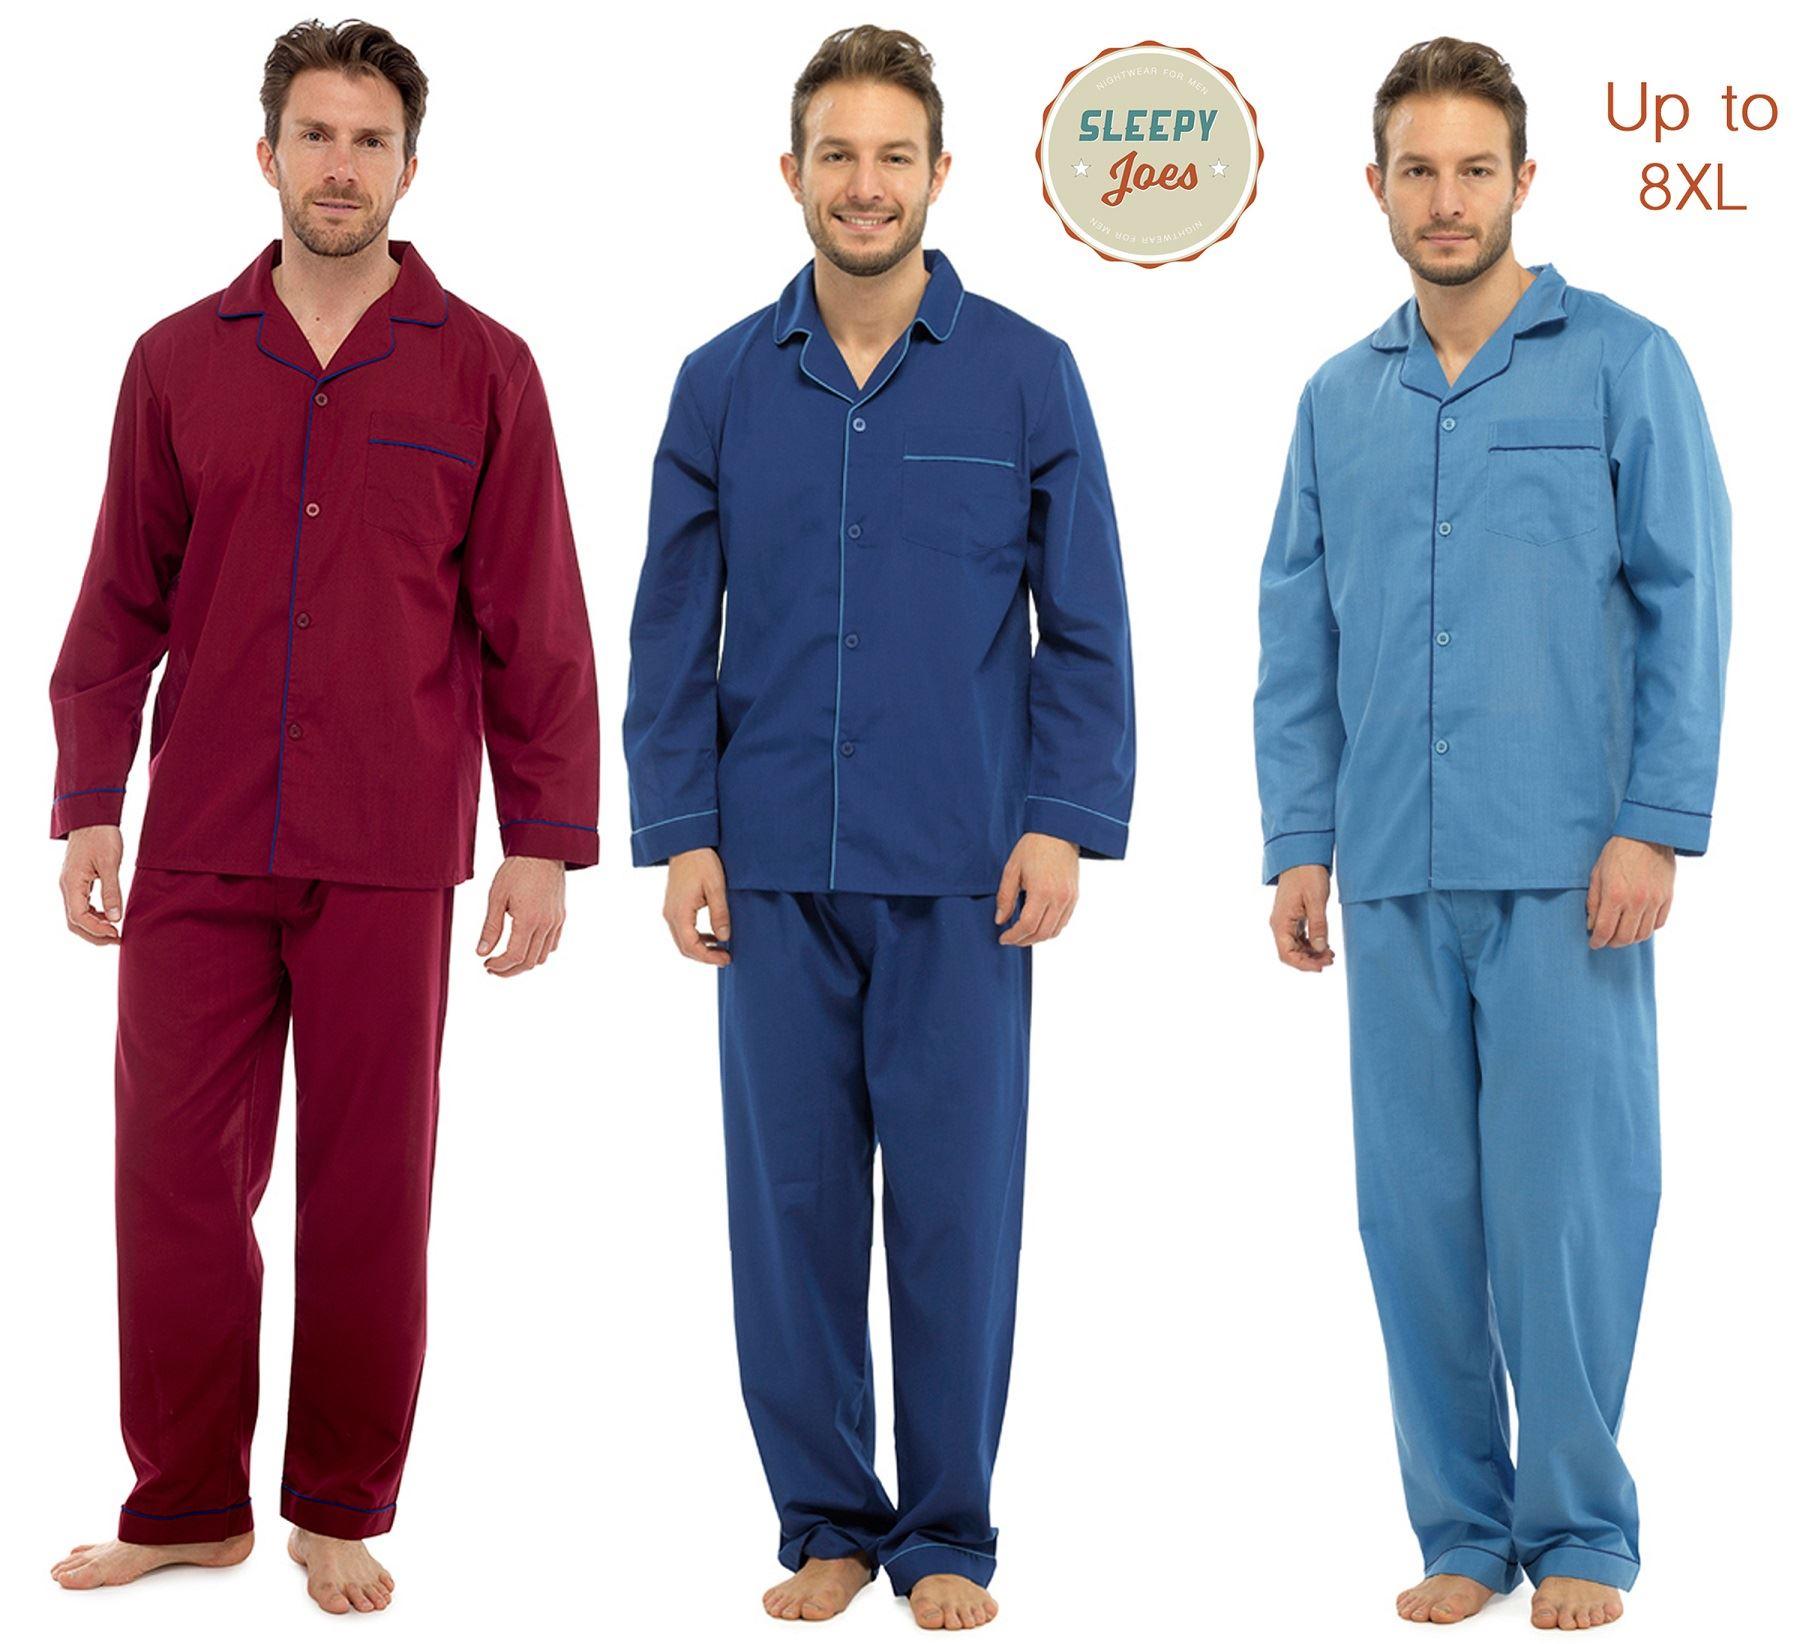 8XL Sleepy Joes Gents Traditional Poly Cotton 1949 Long Pajamas Pjs Nightwear Sizes Small